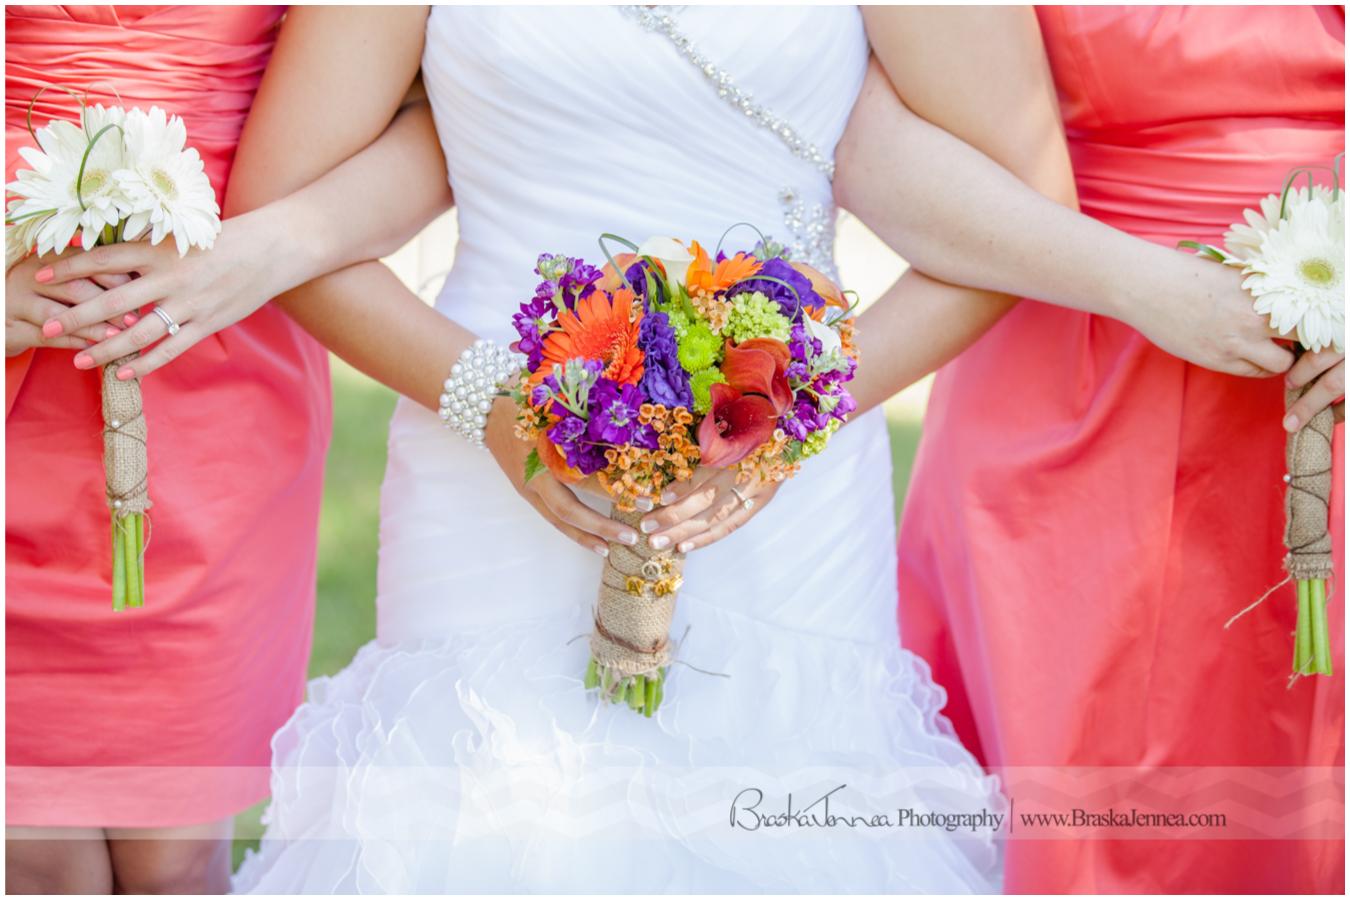 Bridal Bouquet Wedding Flowers Photo